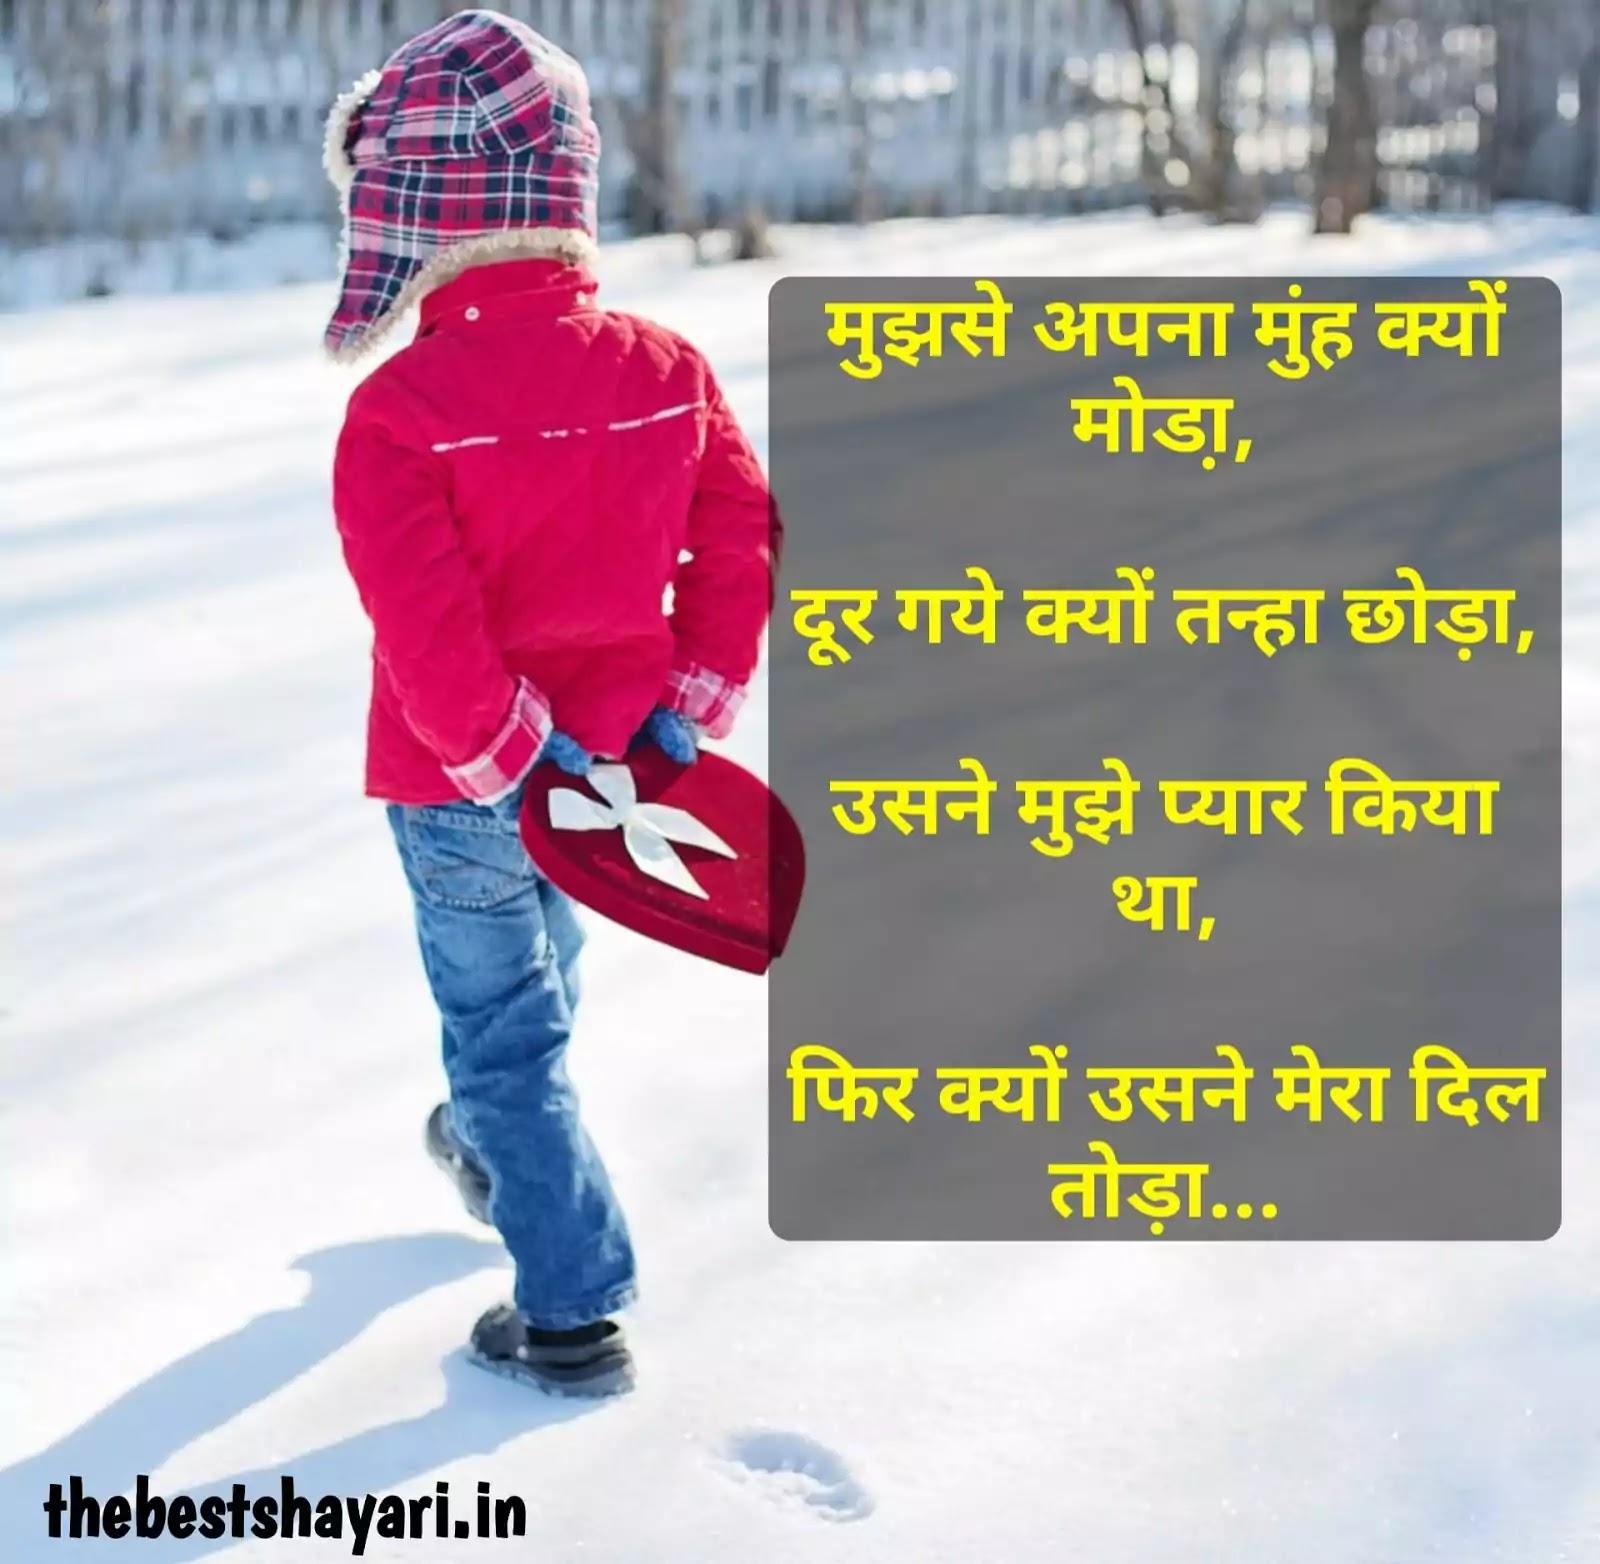 Dard bhari shayari Hindi download